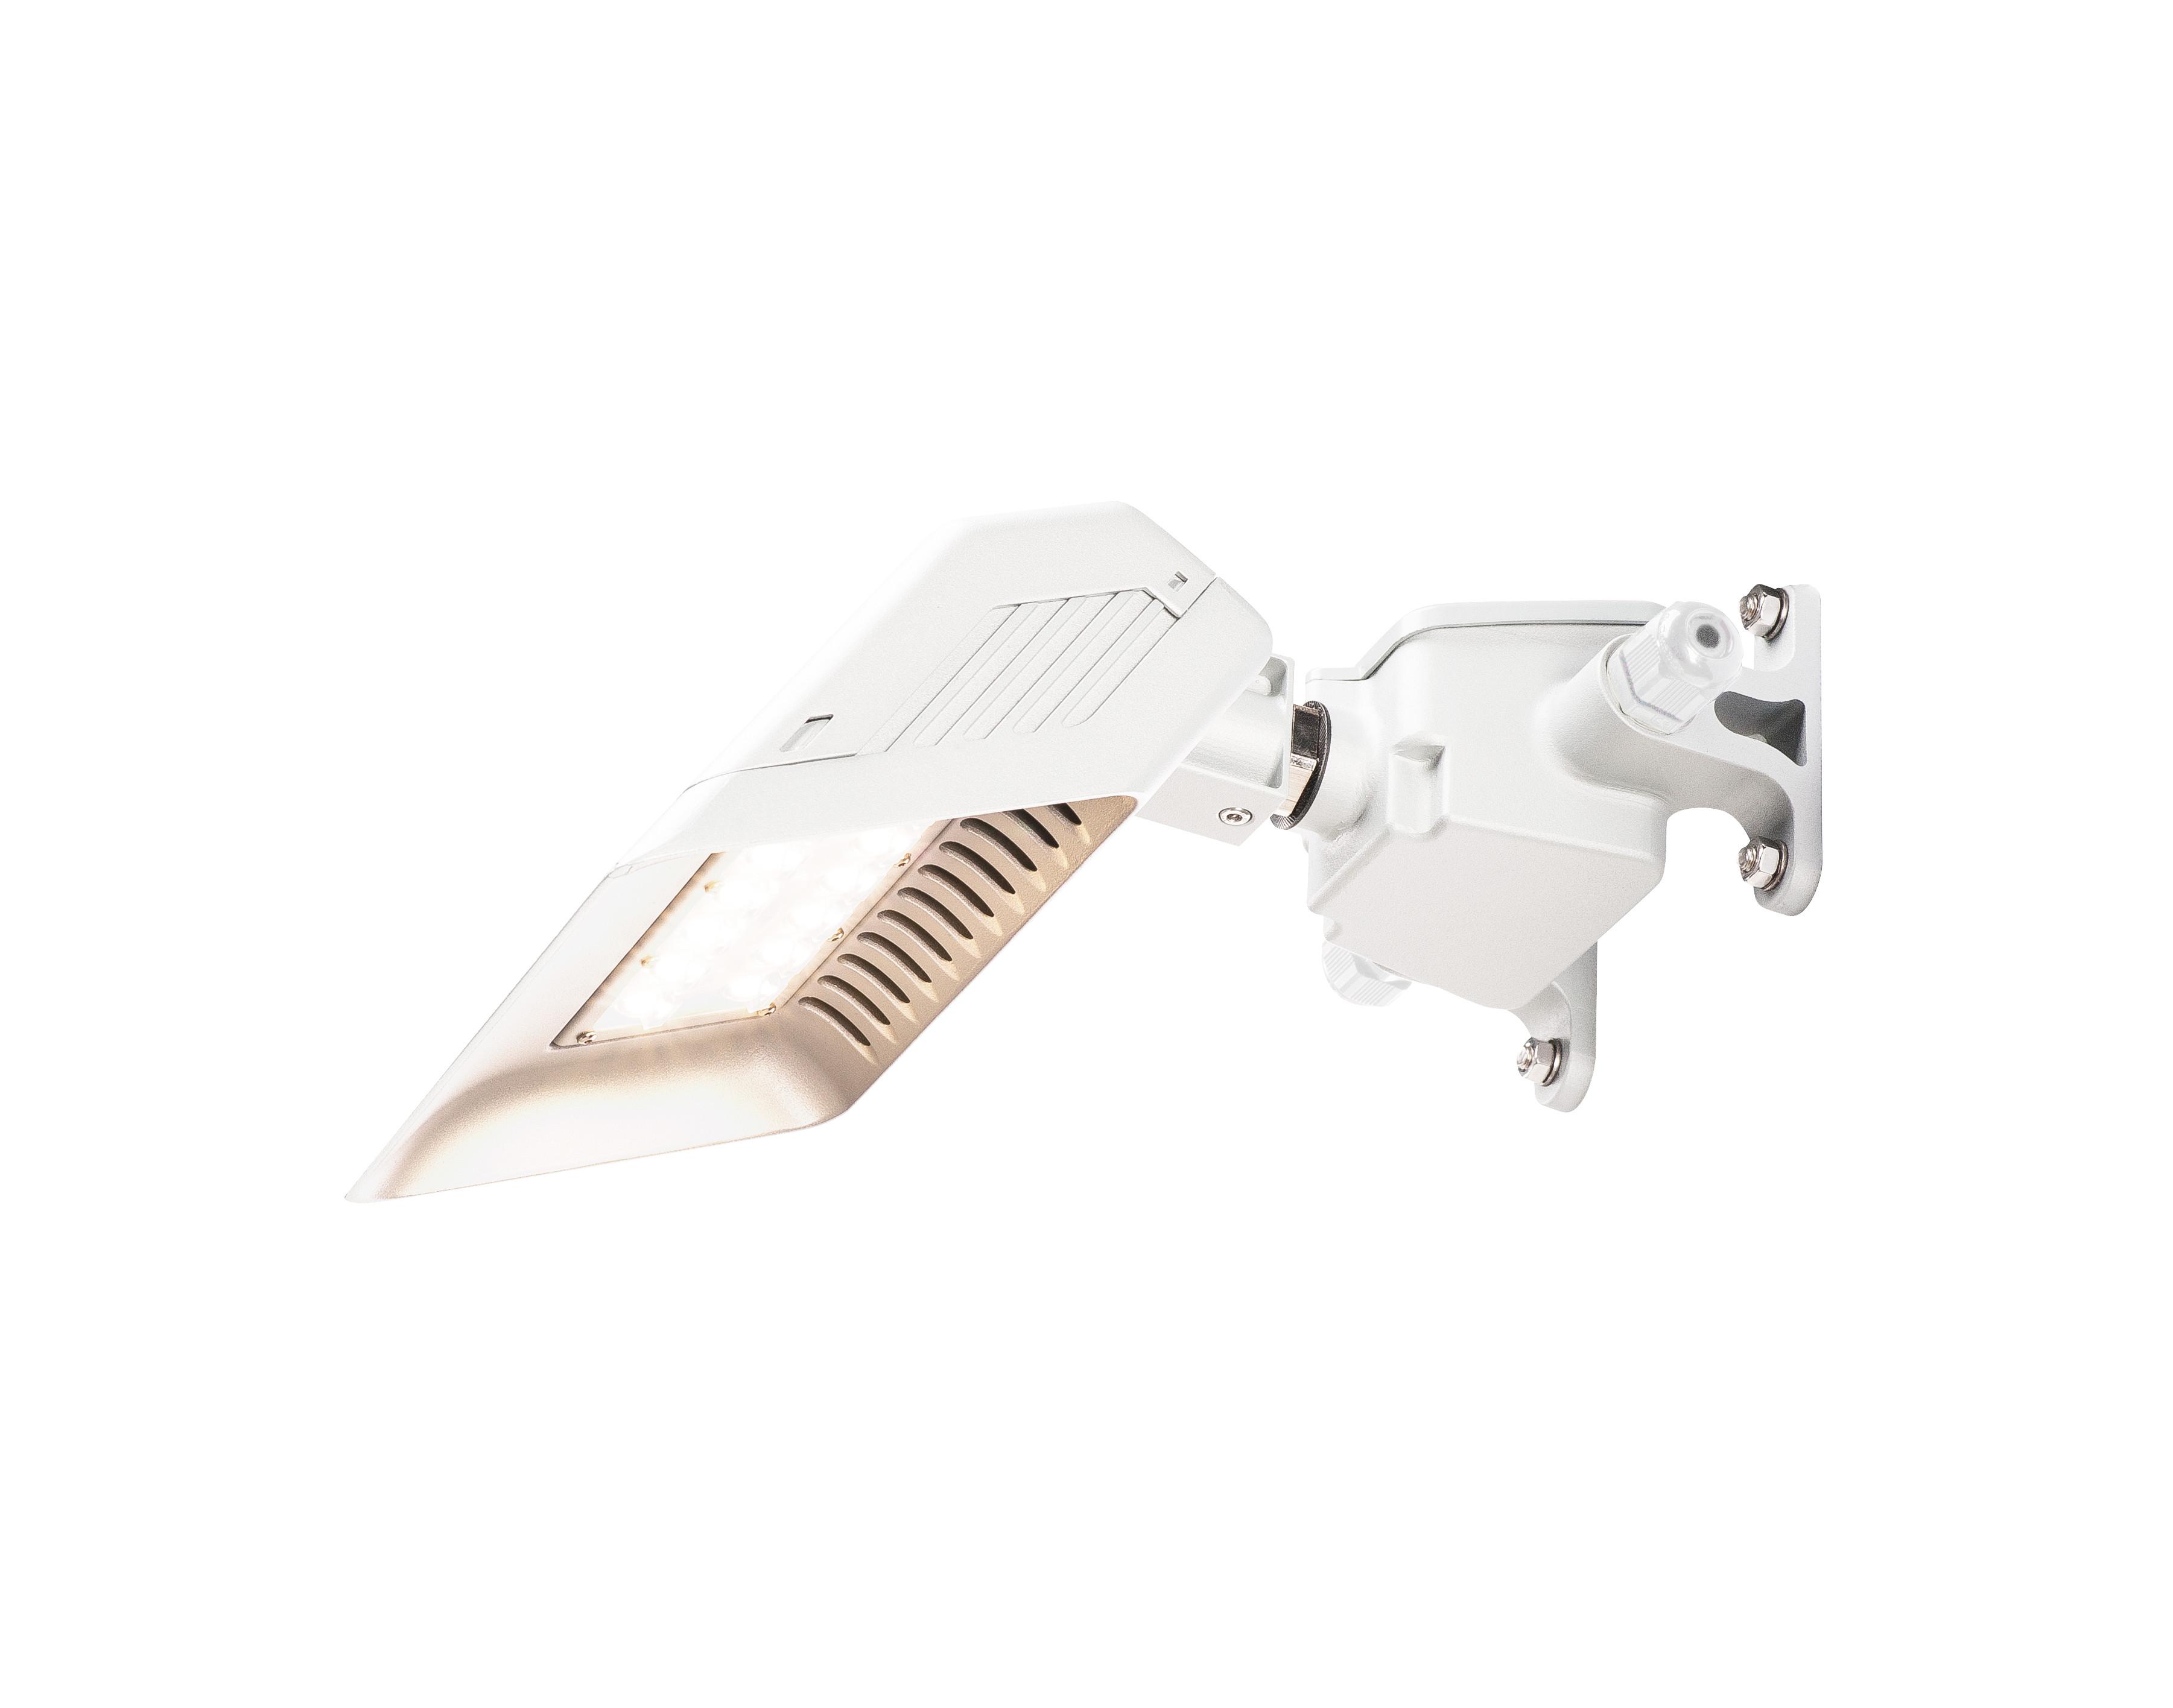 1 Stk TODAY LED Outdoor Displayleuchte, weiß, kurz, 4000K, IP65  LI1000884-